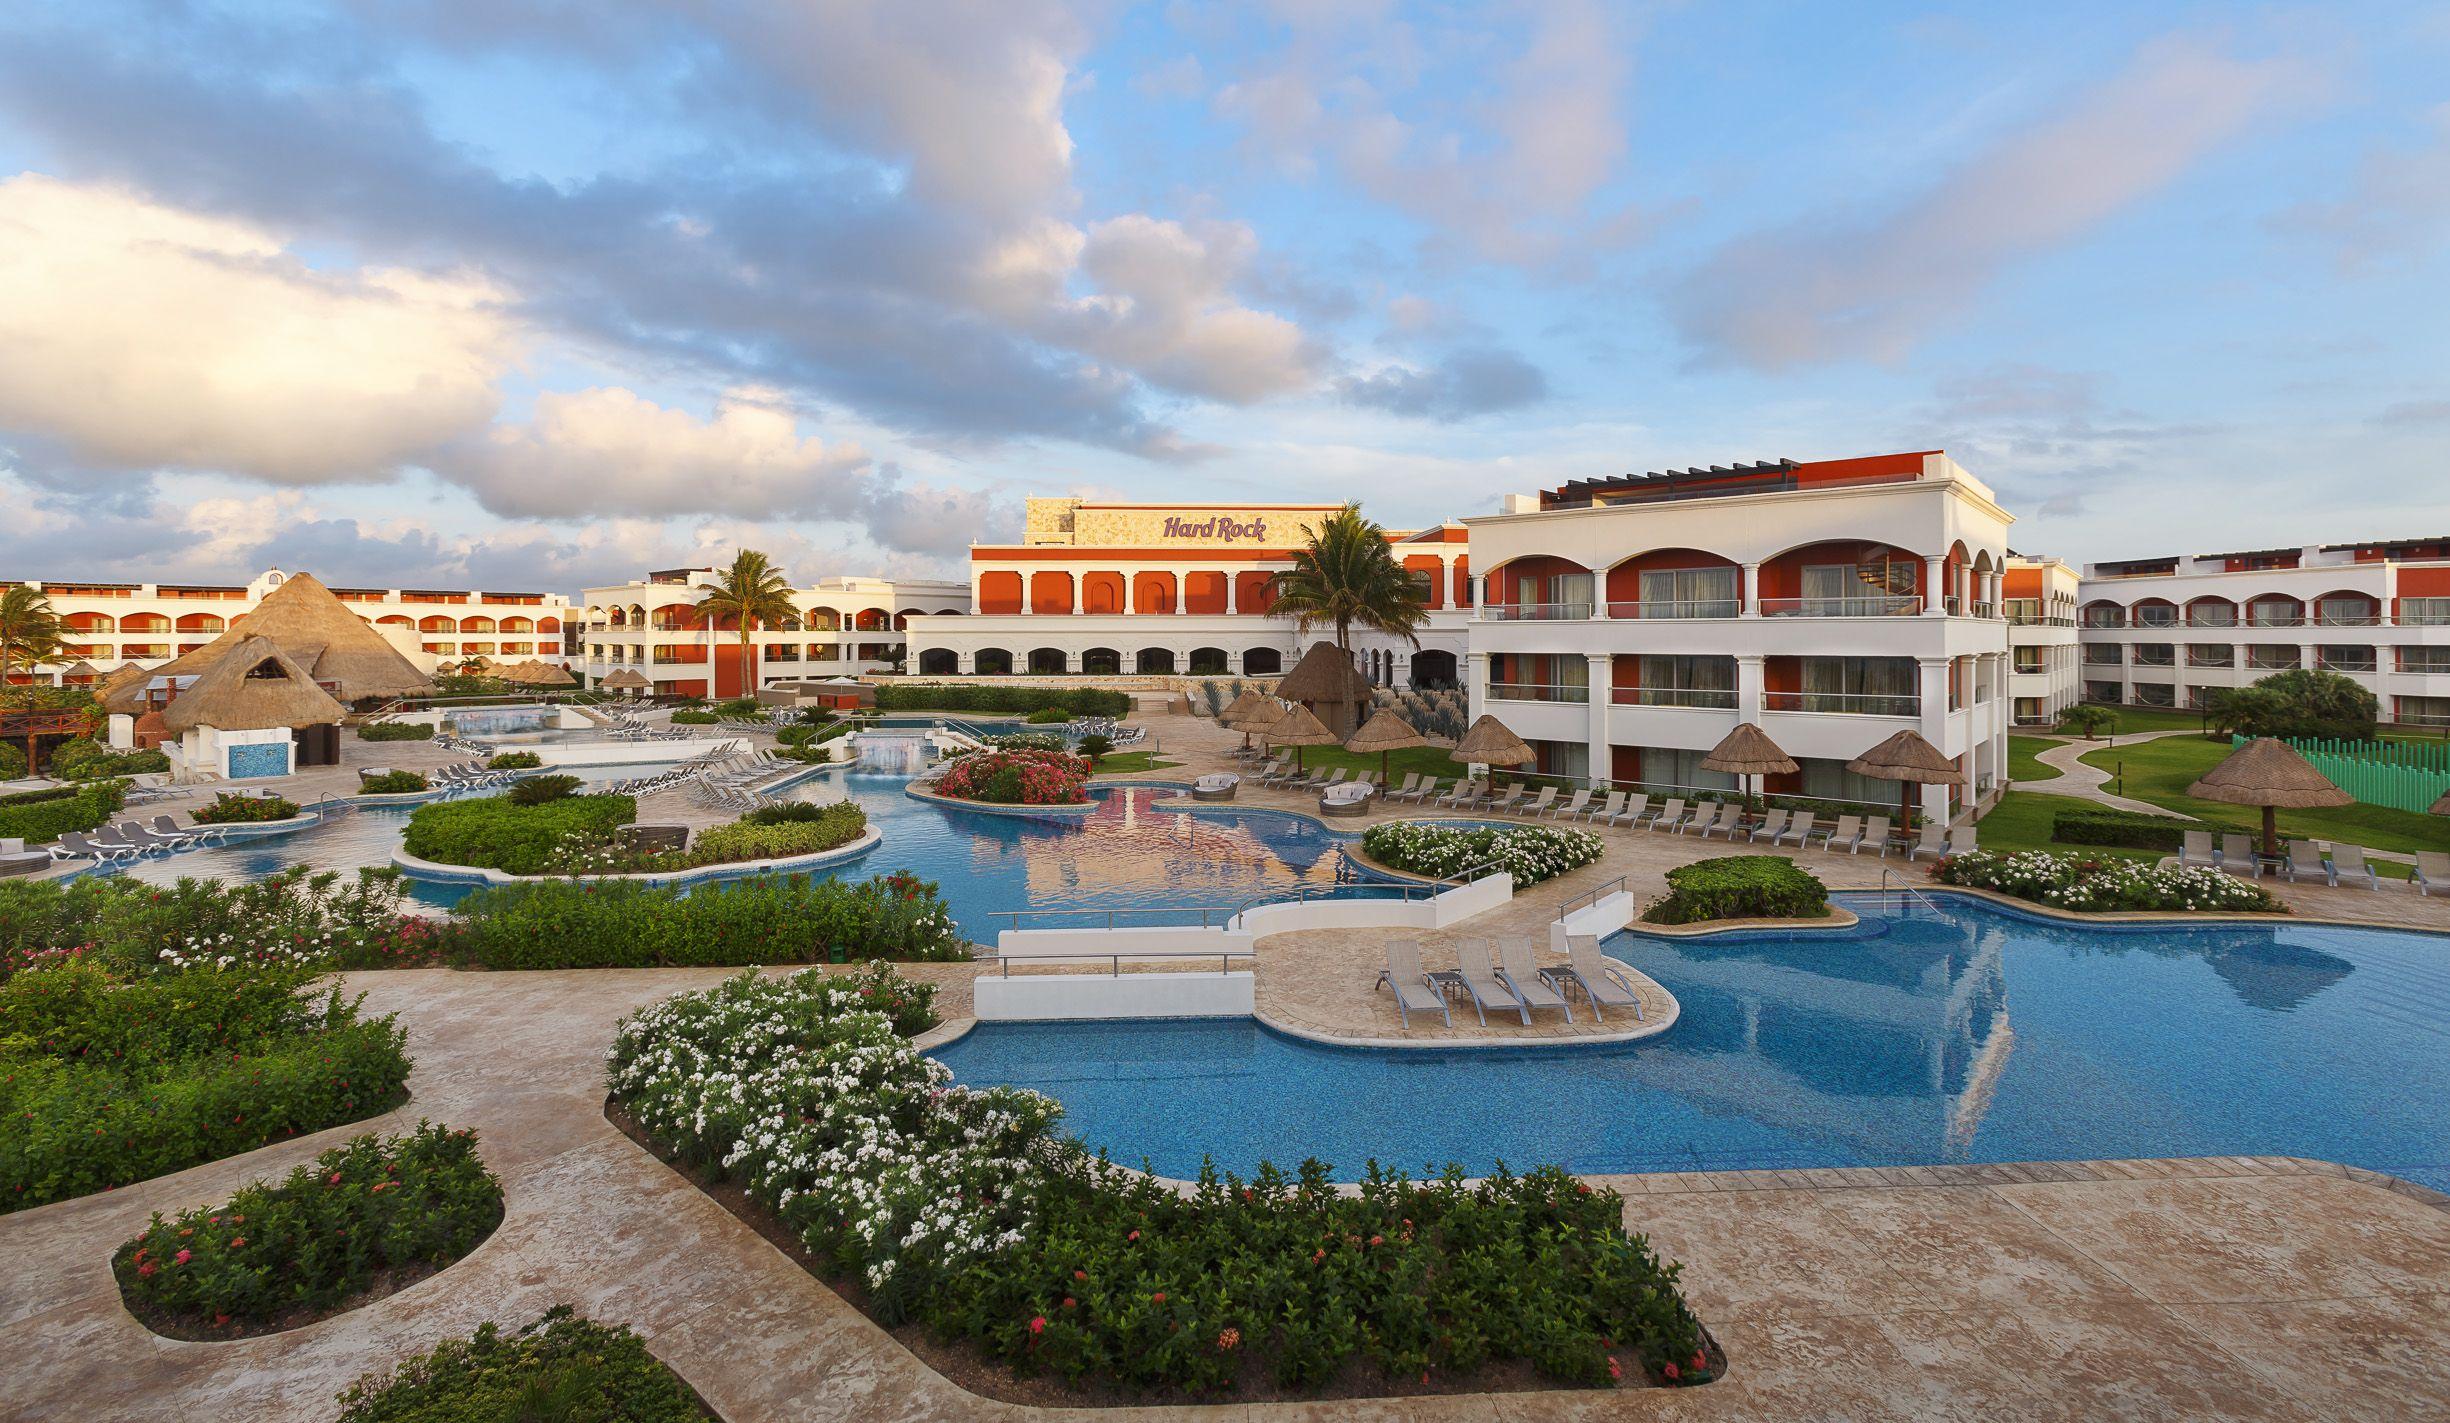 Hard Rock Hotel Riviera Maya Hacienda In Puerto Aventuras Mexico Holidays From 1193pp Loveholidays